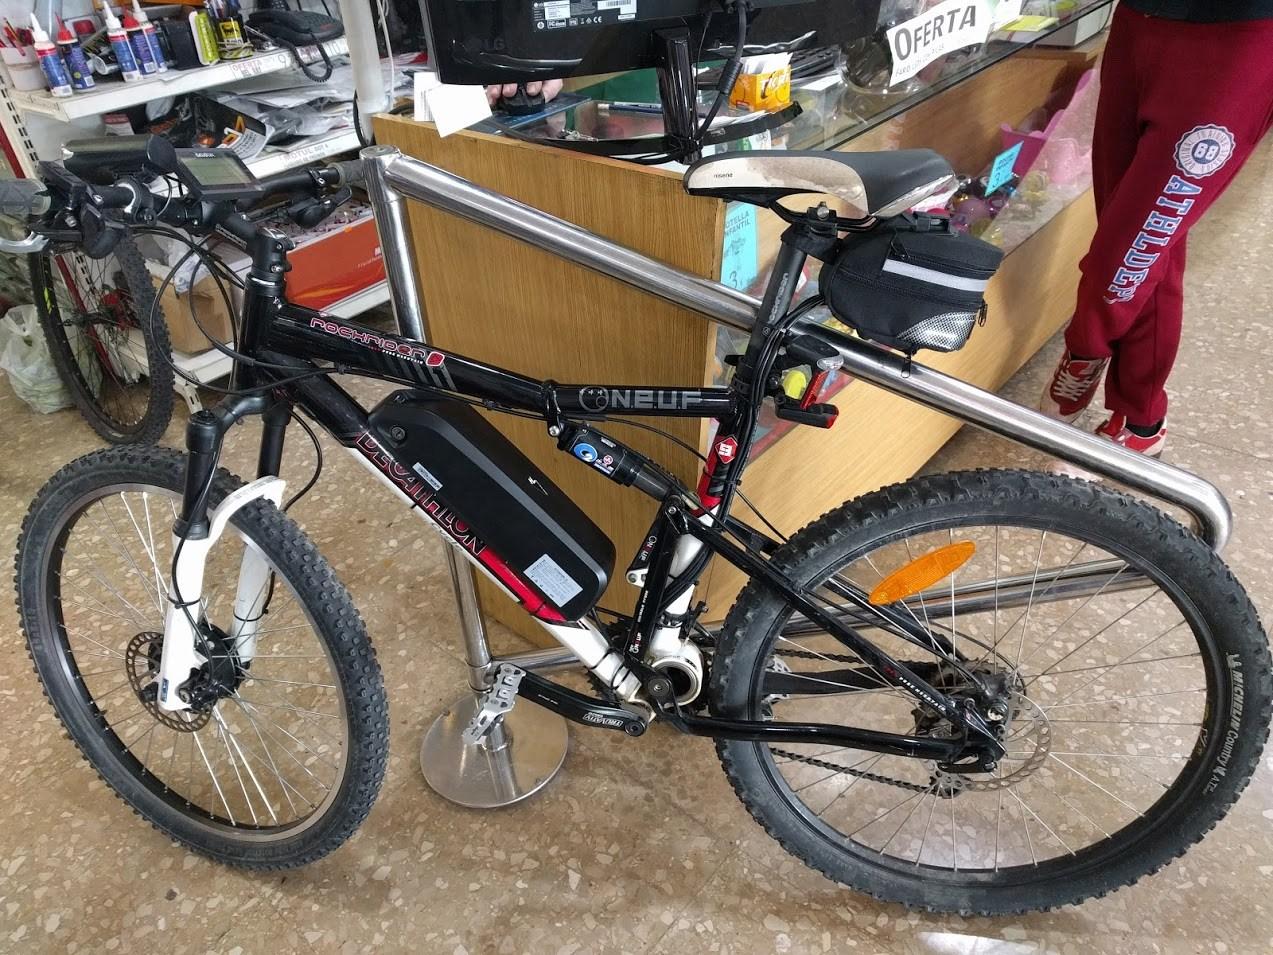 Bicicleta Decathlon transformada en bicicleta eléctrica